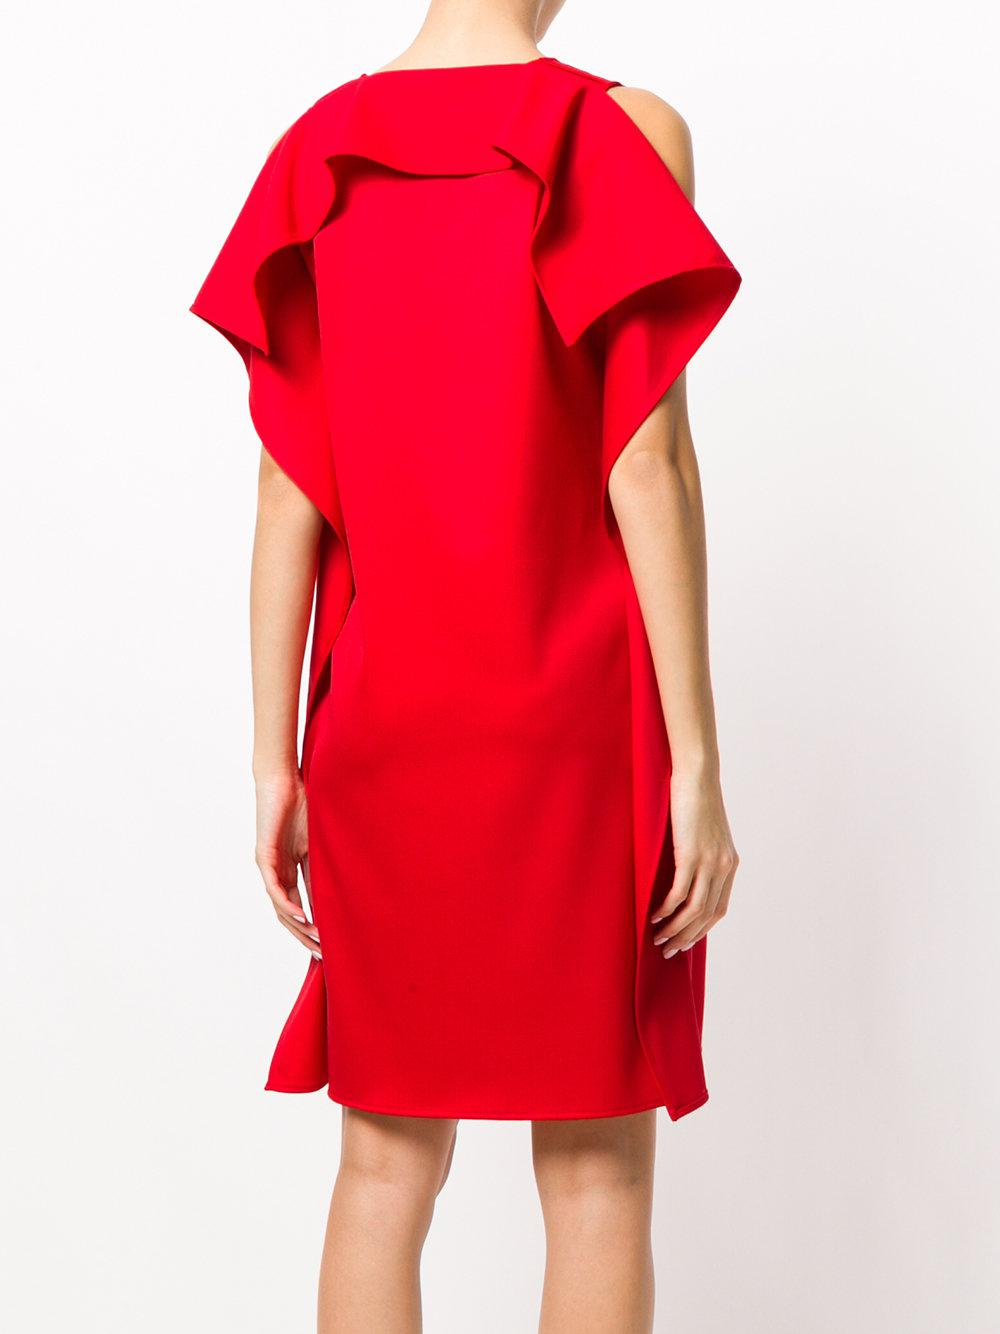 ruffle shift dress - Red Maison Martin Margiela bfjvmS5